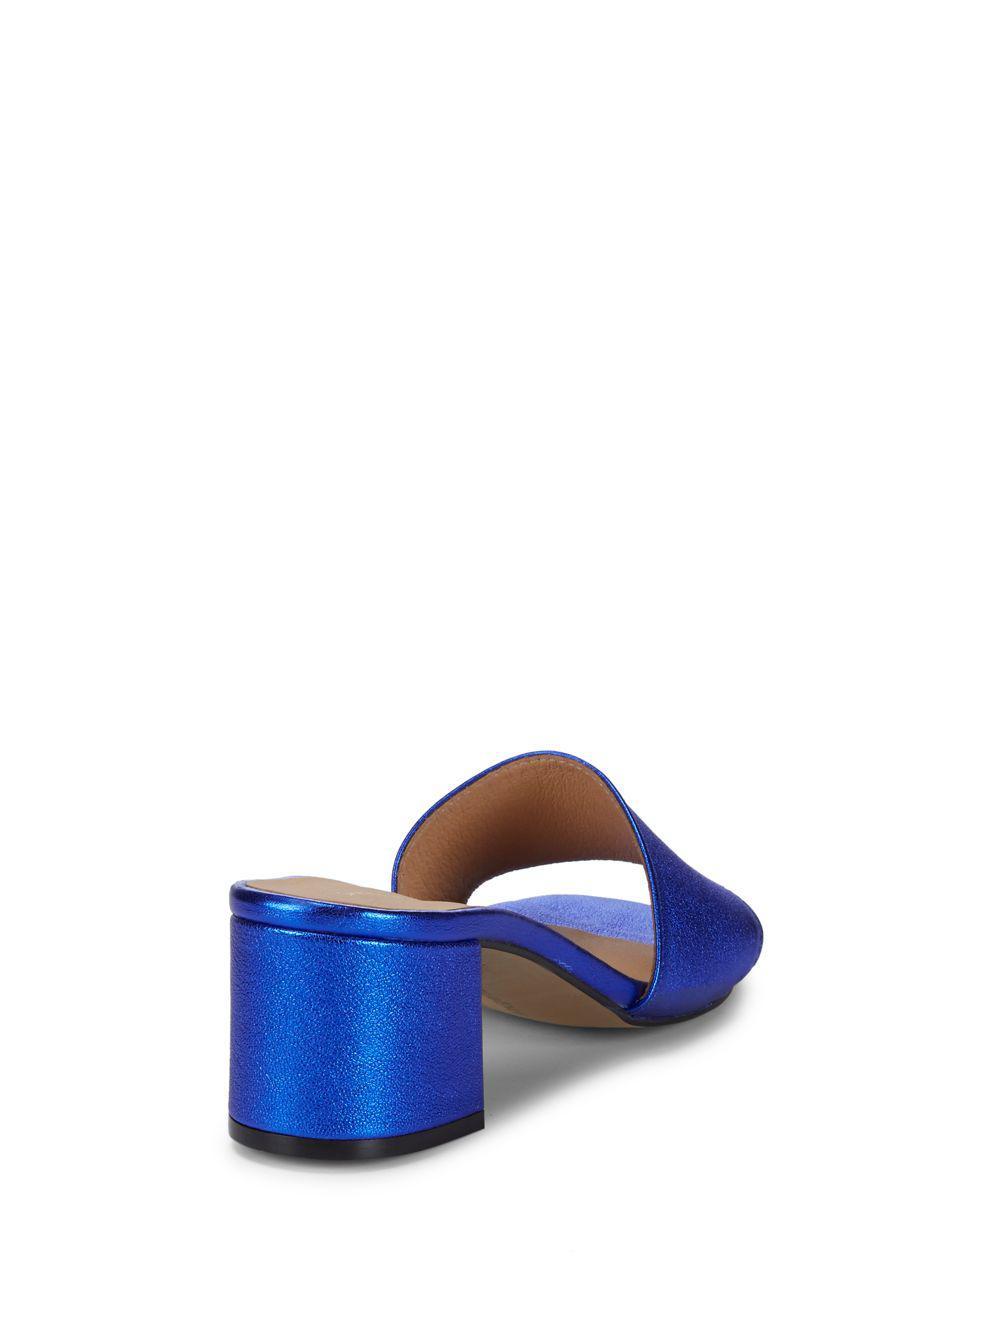 f7bd41985196 Saks Fifth Avenue - Blue Metallic Block Heel Leather Sandals - Lyst. View  fullscreen